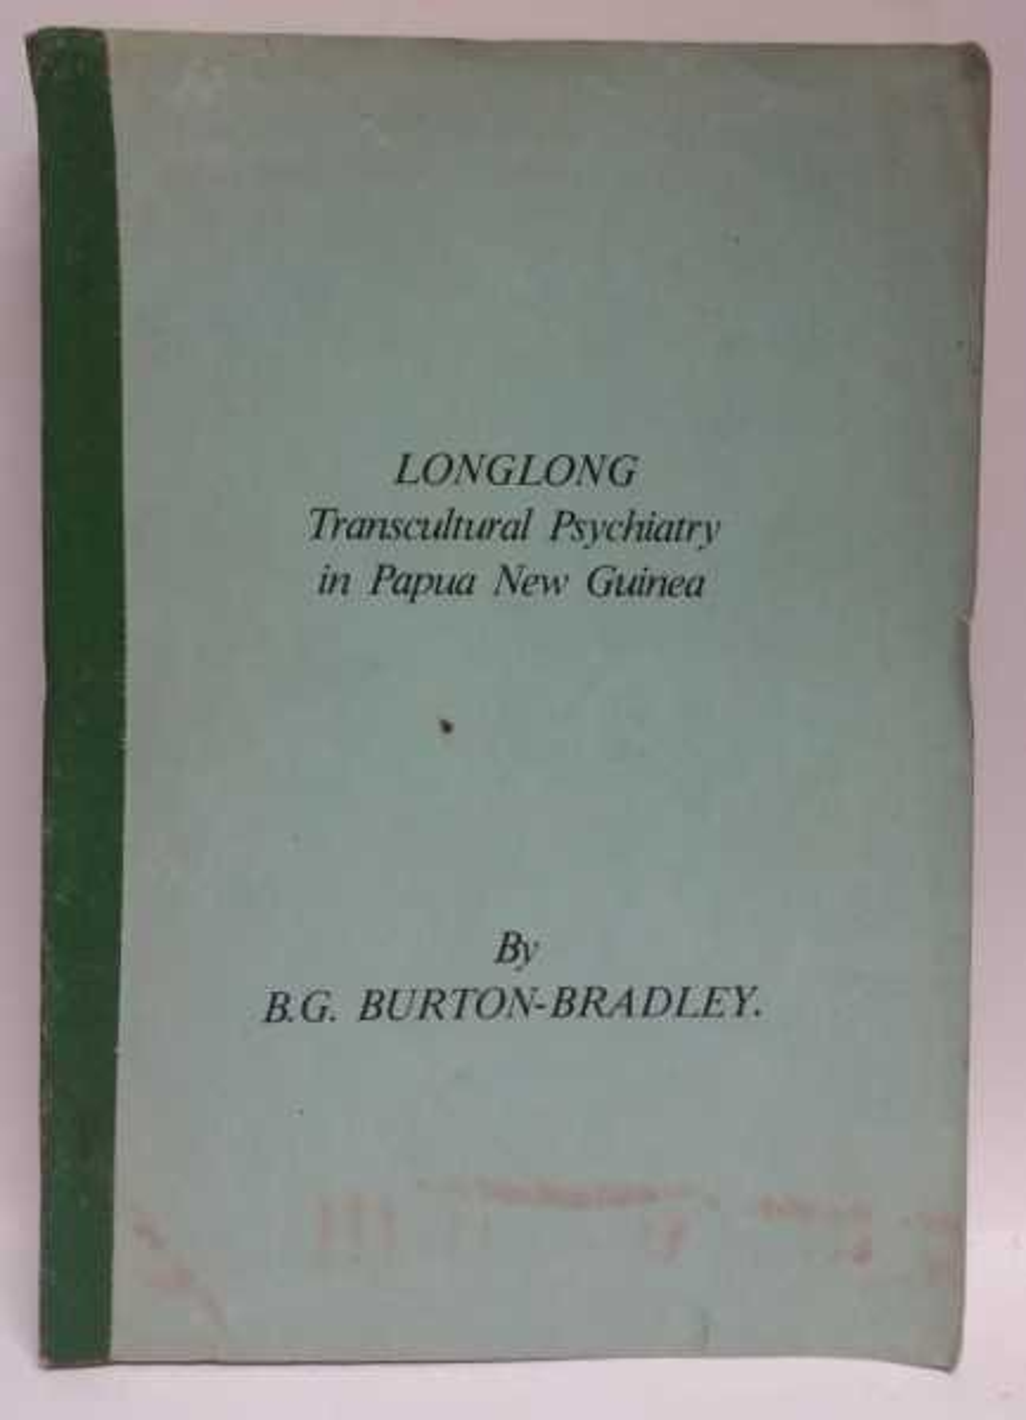 LONGLONG: Transcultural Psychiatry in Papua New Guinea, B.G. Burton-Bradley